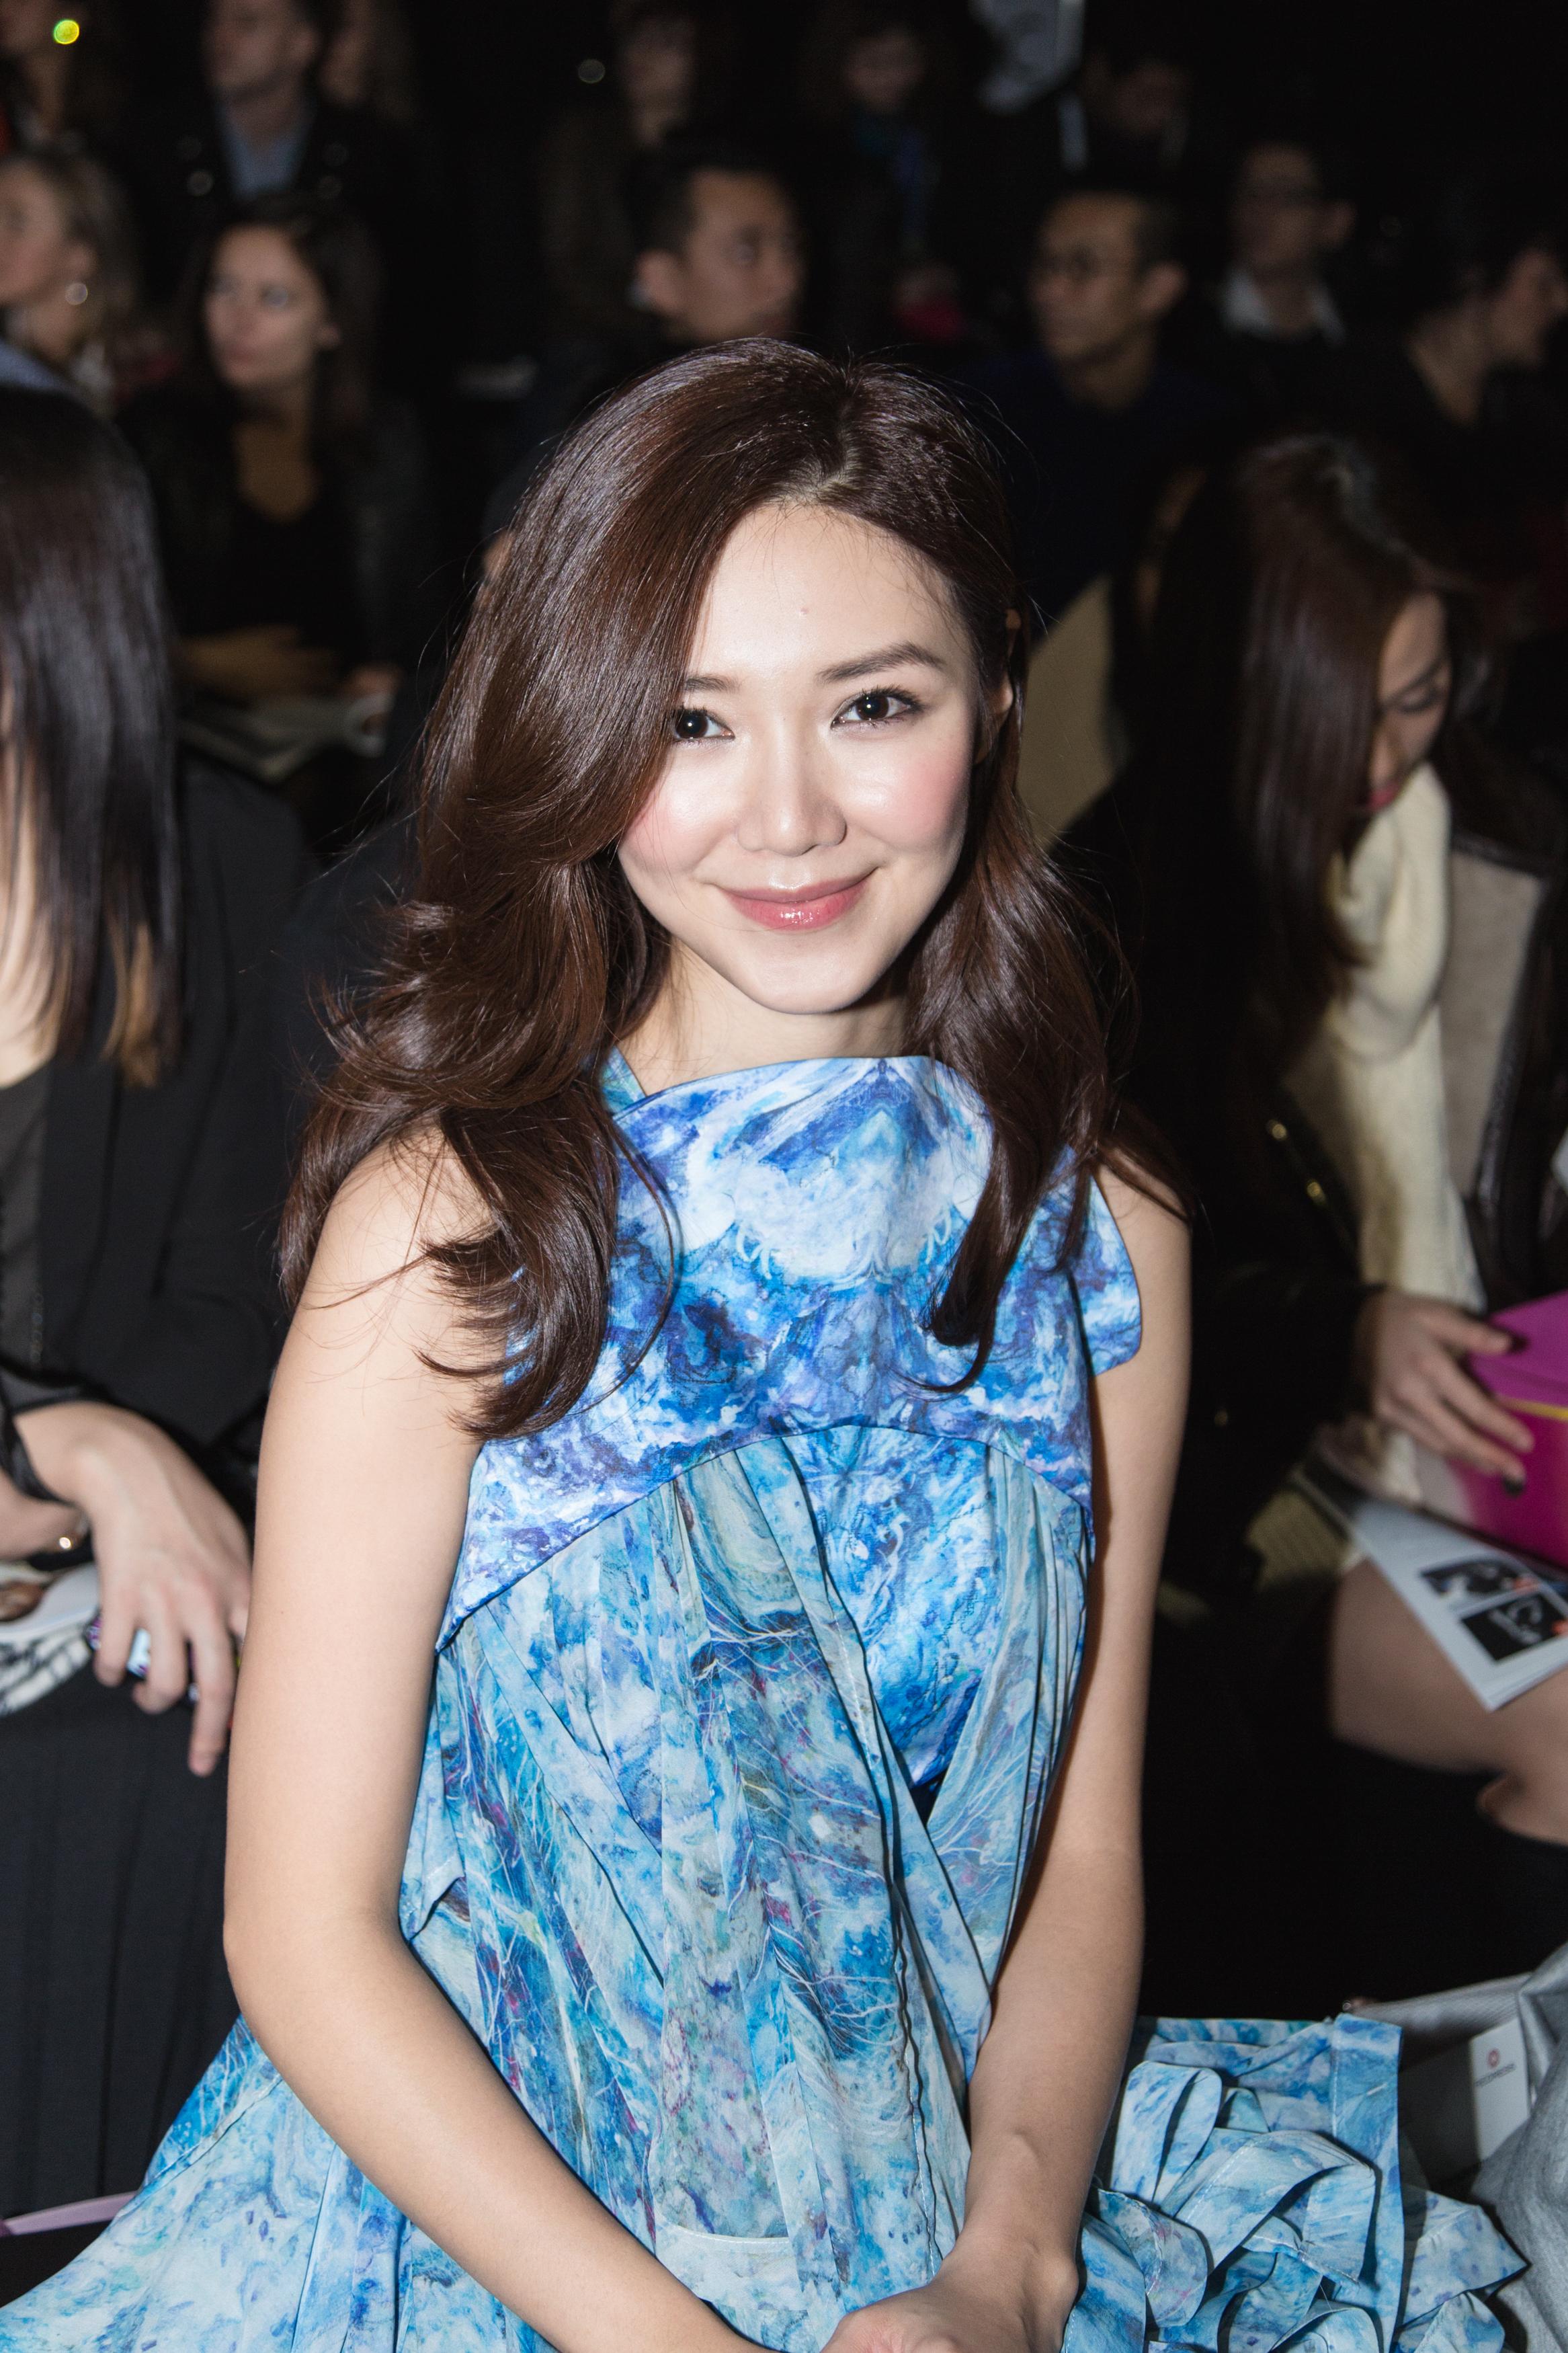 Hong Kong actress Elva Ni wears Angus Tsui to attend the Redress Design Award 2015/16 Grand Final Show